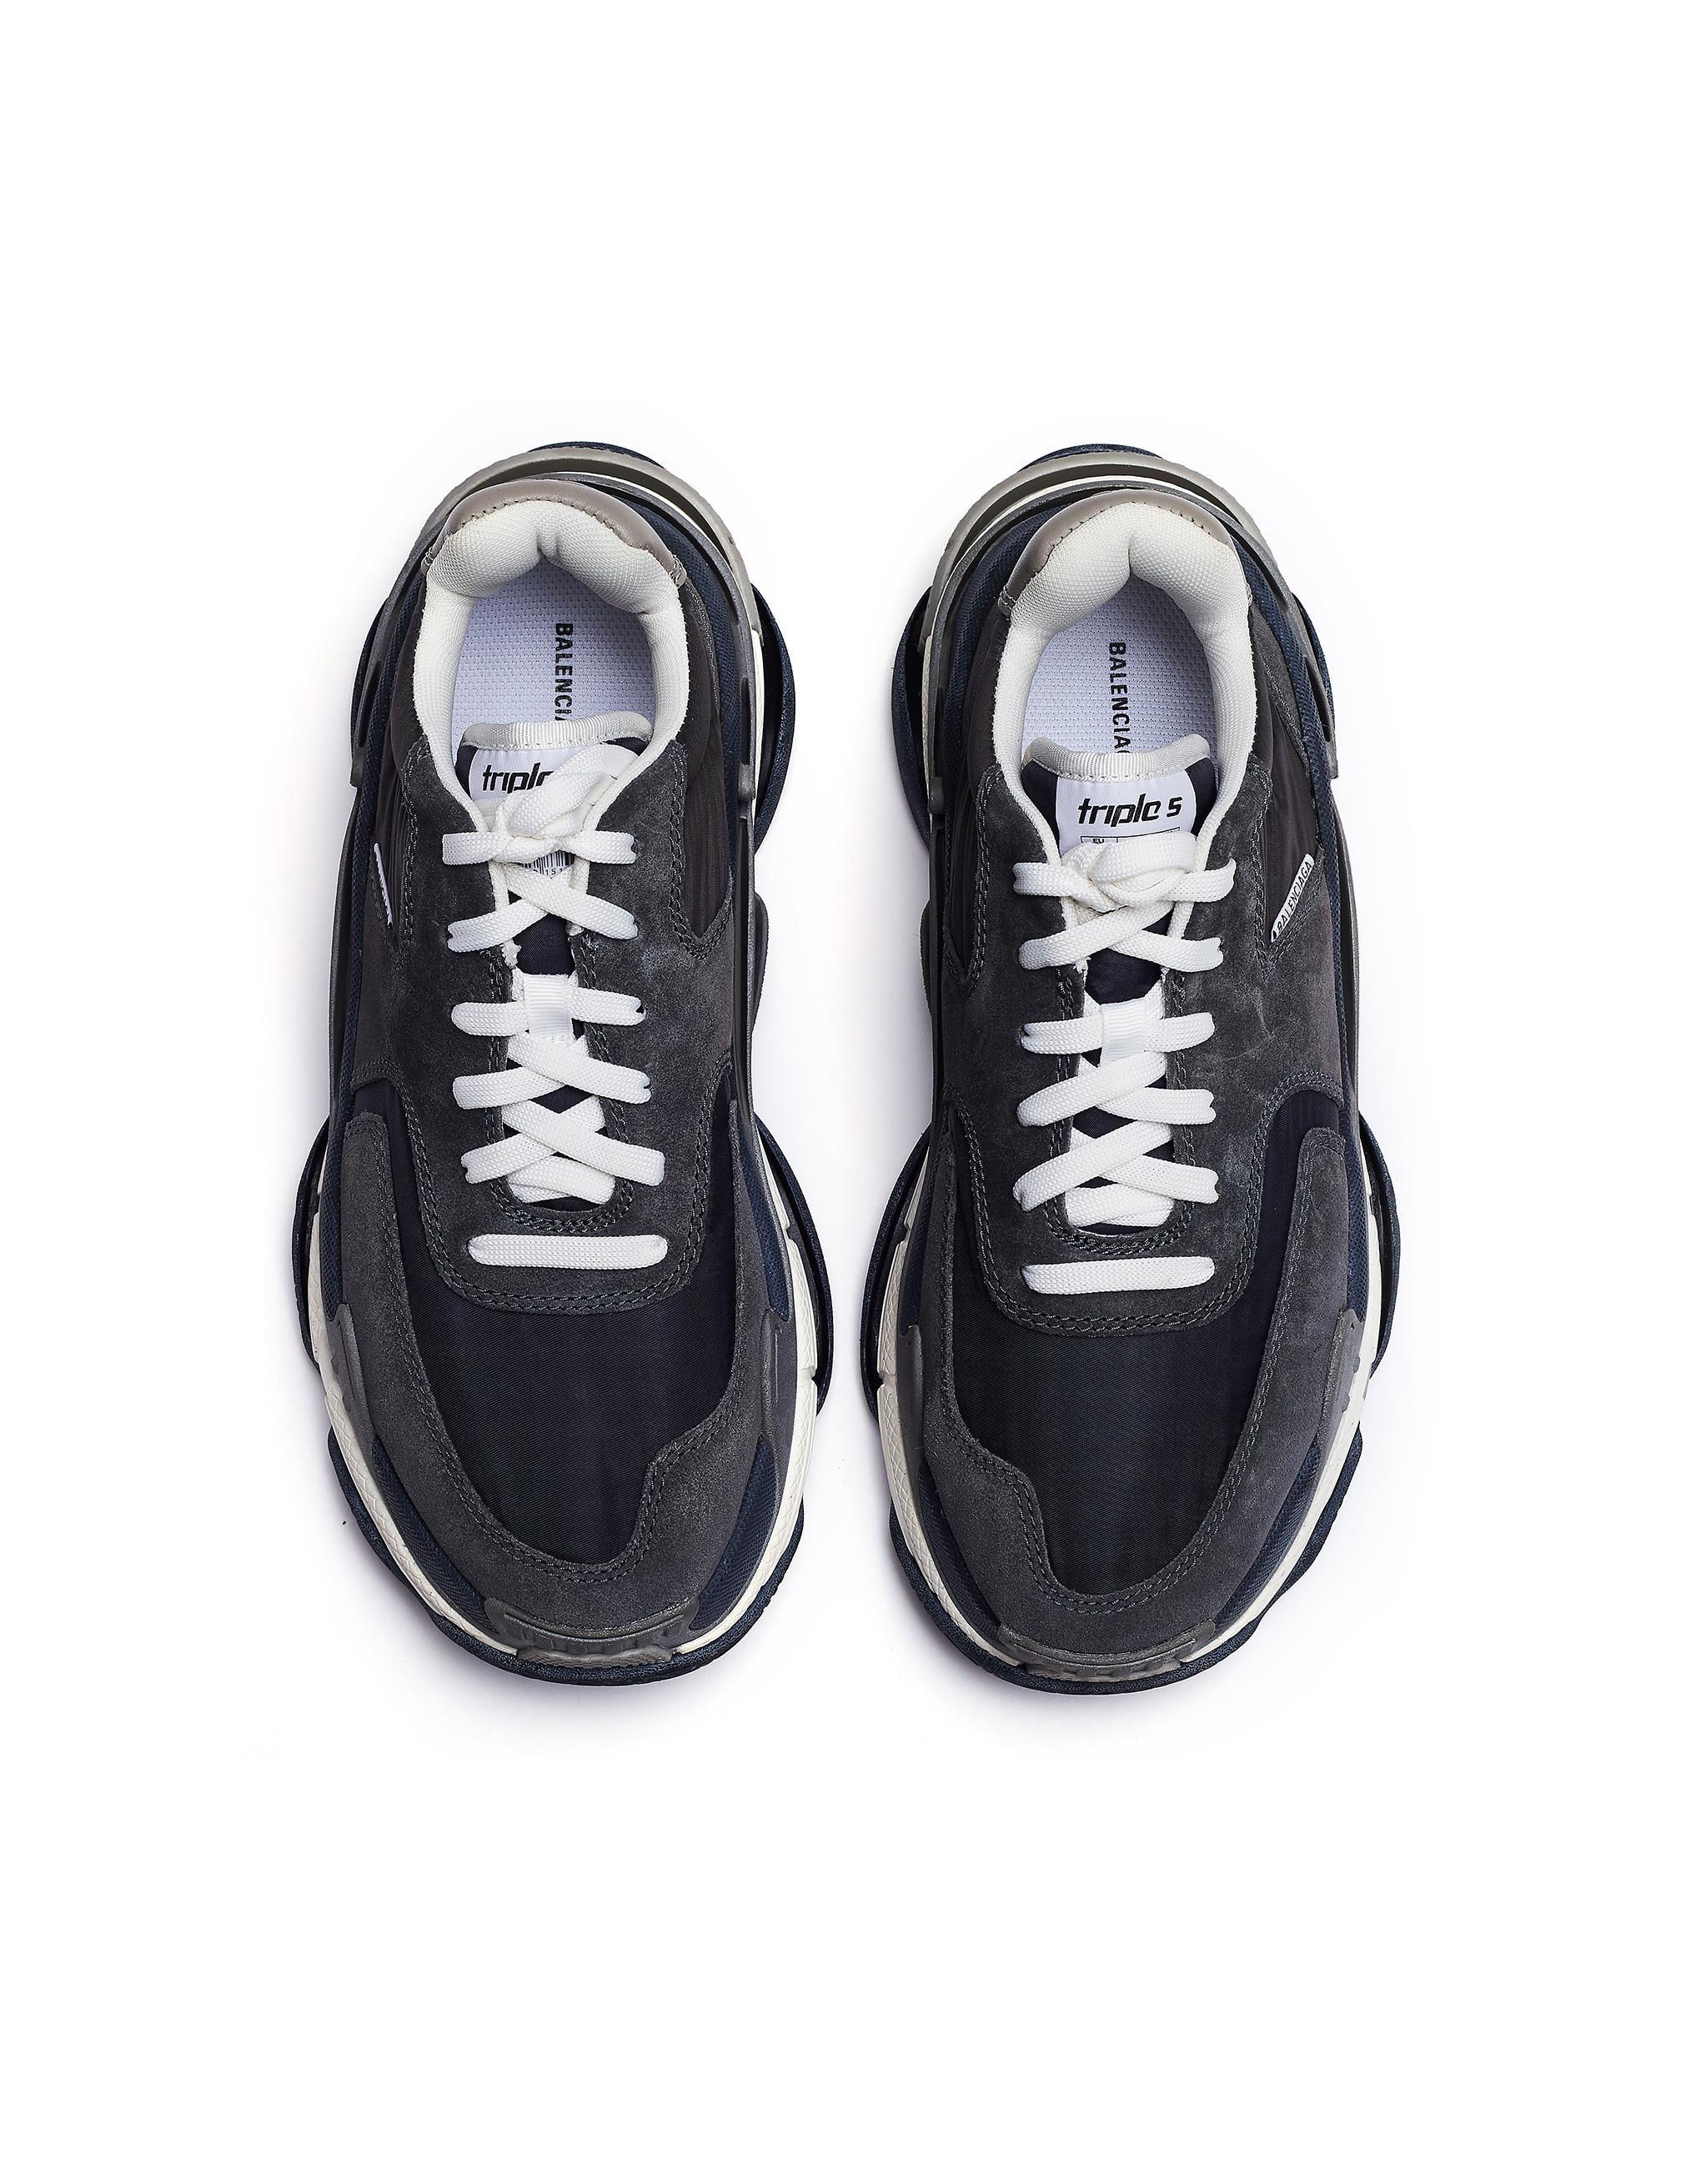 ec5f3ee1fc13c Lyst - Balenciaga Grey Triple S Sneakers in Gray for Men